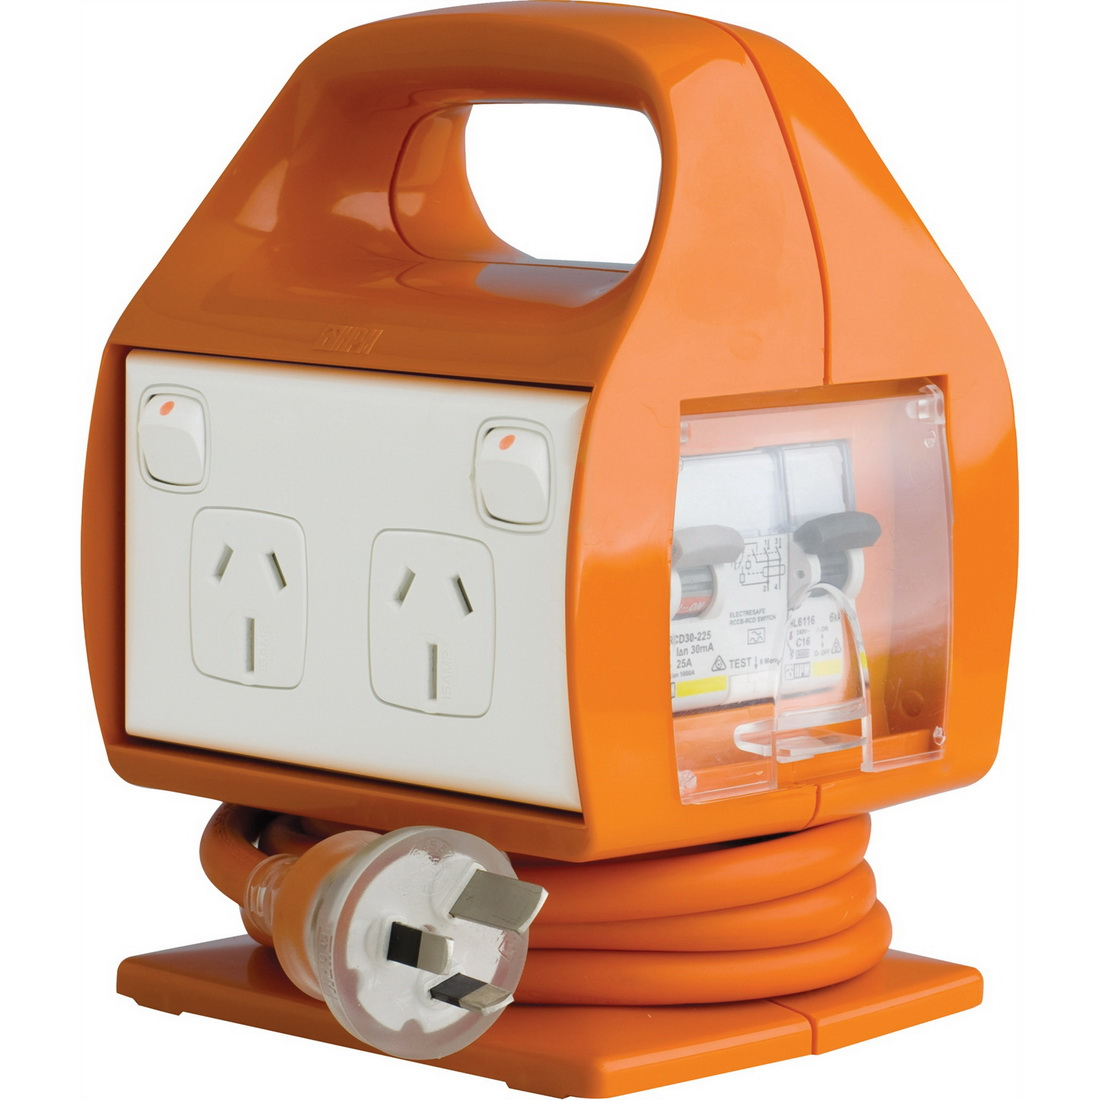 4 Outlet Electresafe Electresafe Power Centre with RCBO Protection